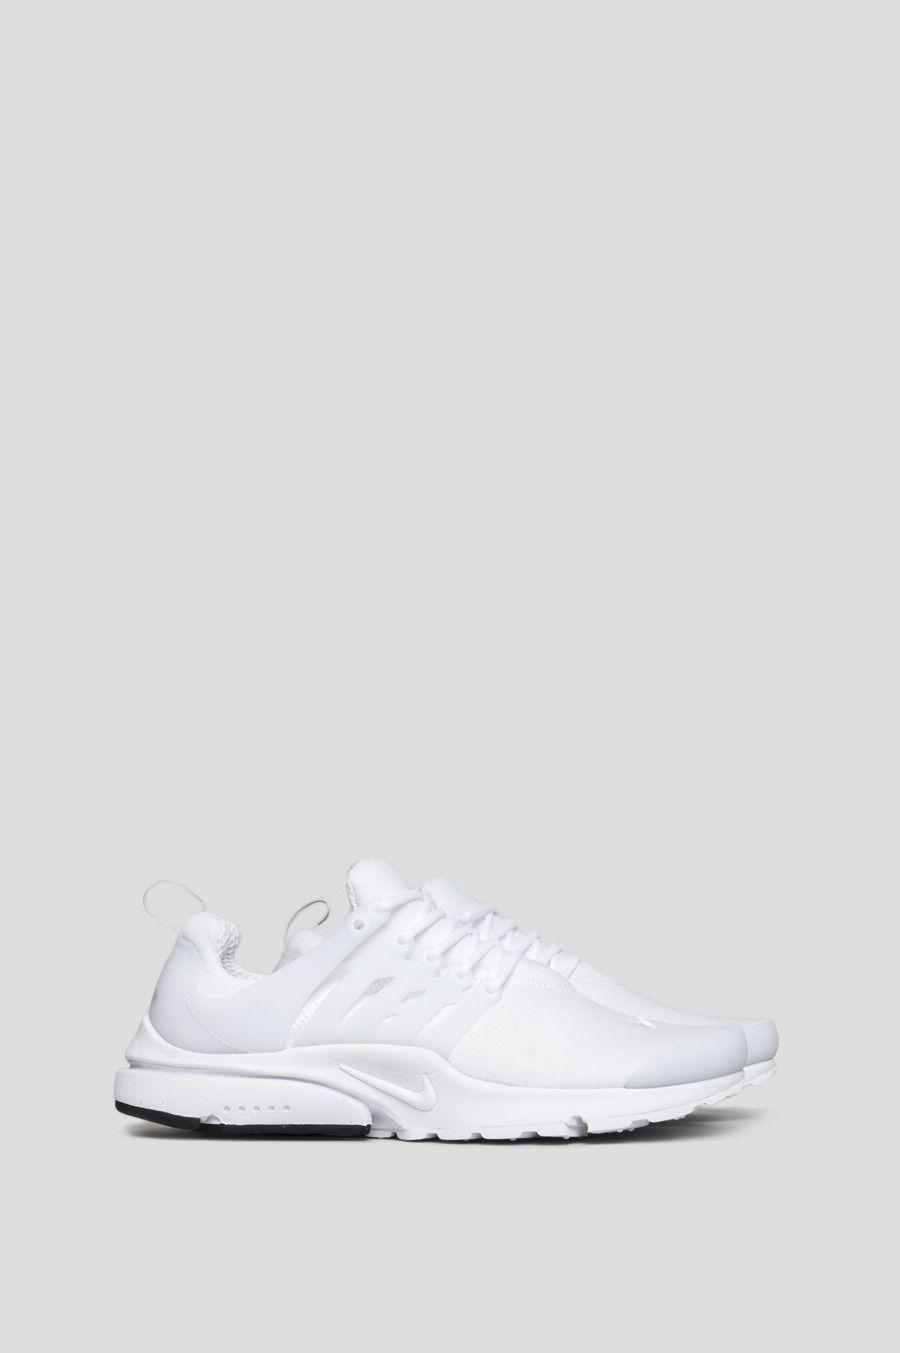 8517056d69b0 NIKE AIR PRESTO ESSENTIAL WHITE WHITE BLACK